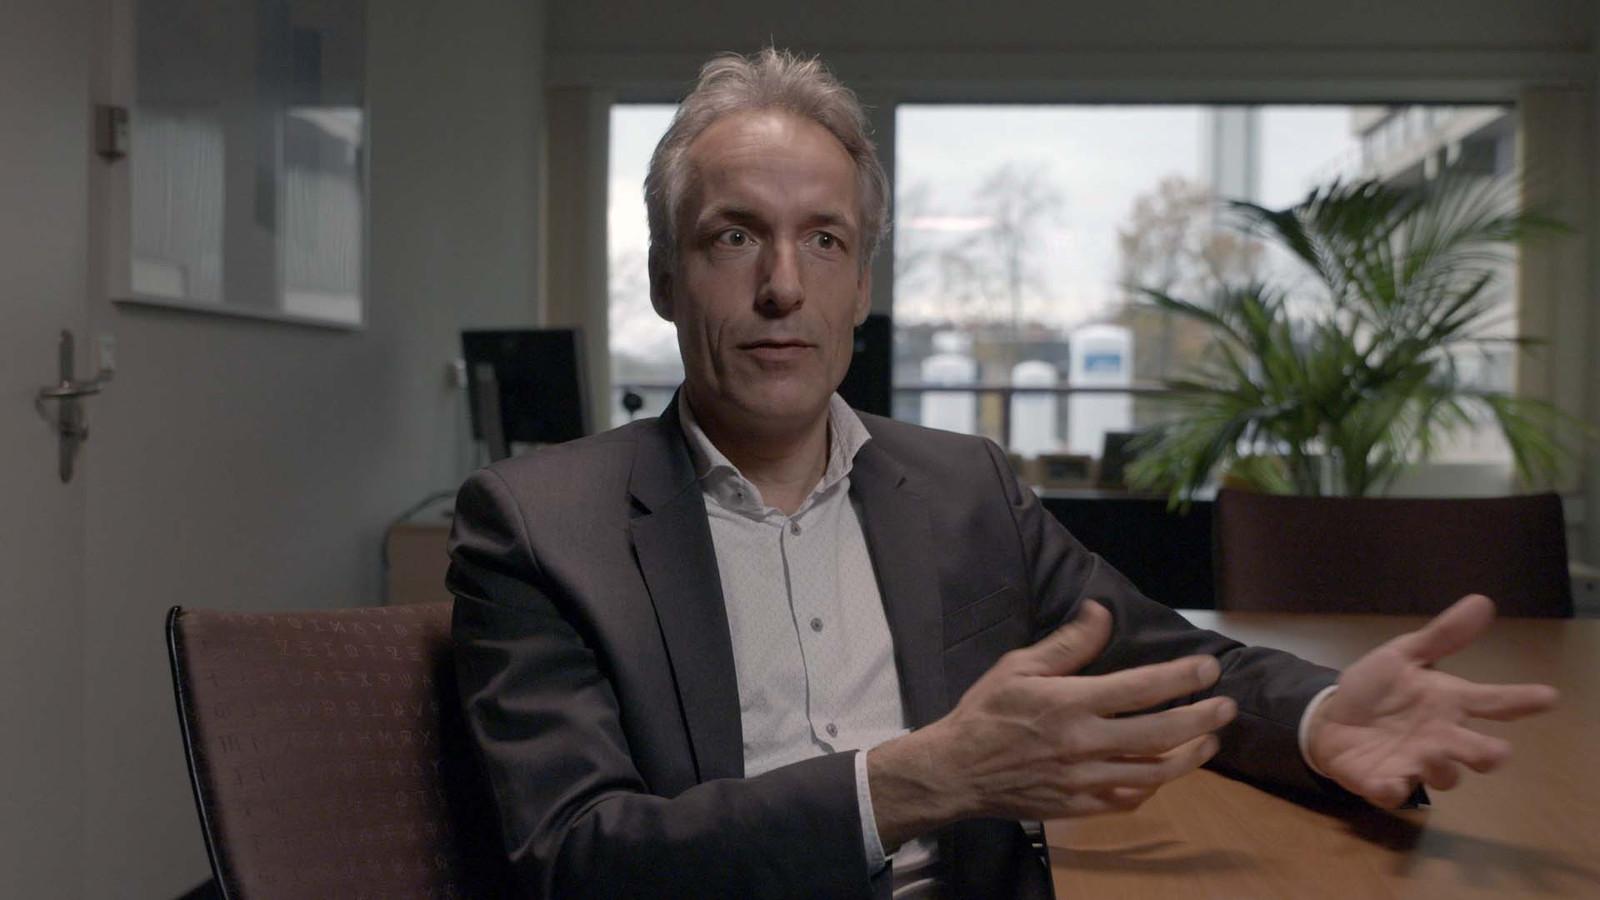 Rob van der Kolk